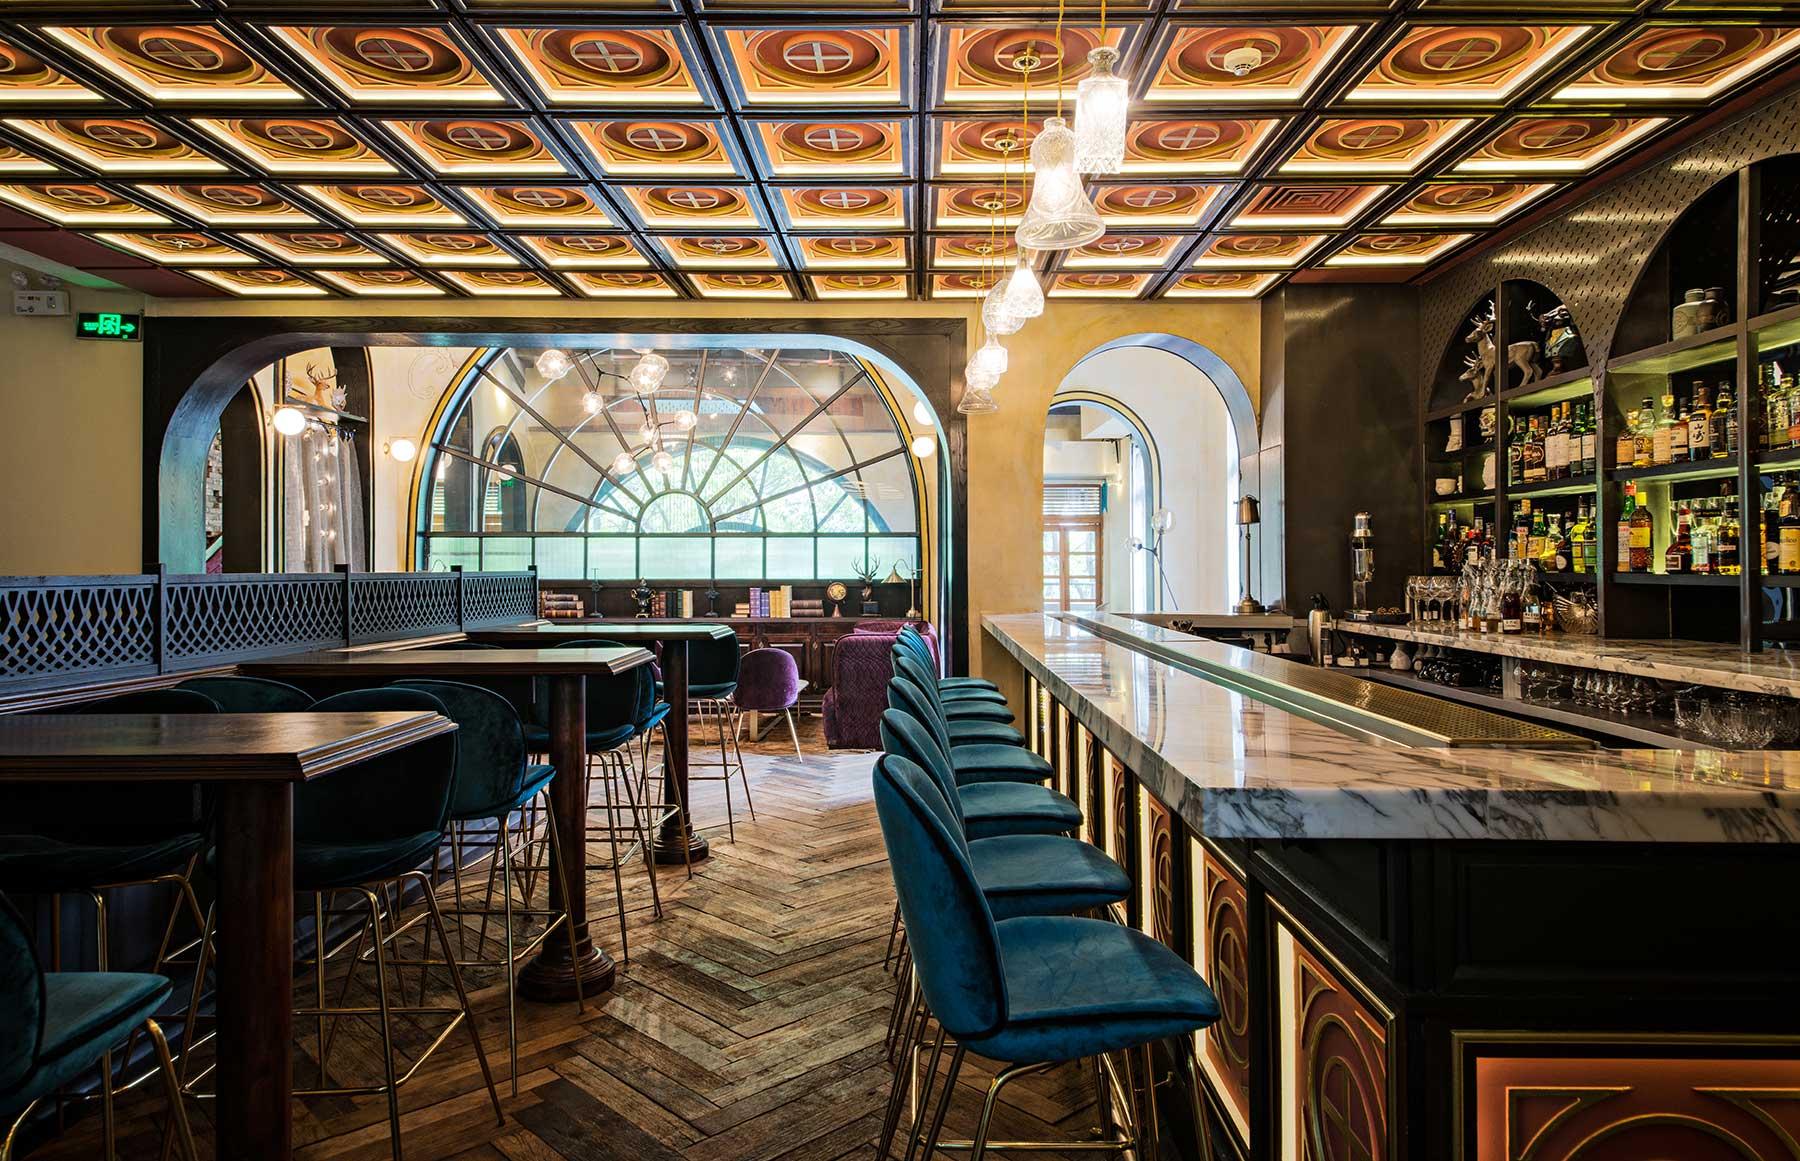 The Locksmith, China - interior design by Studio Y.